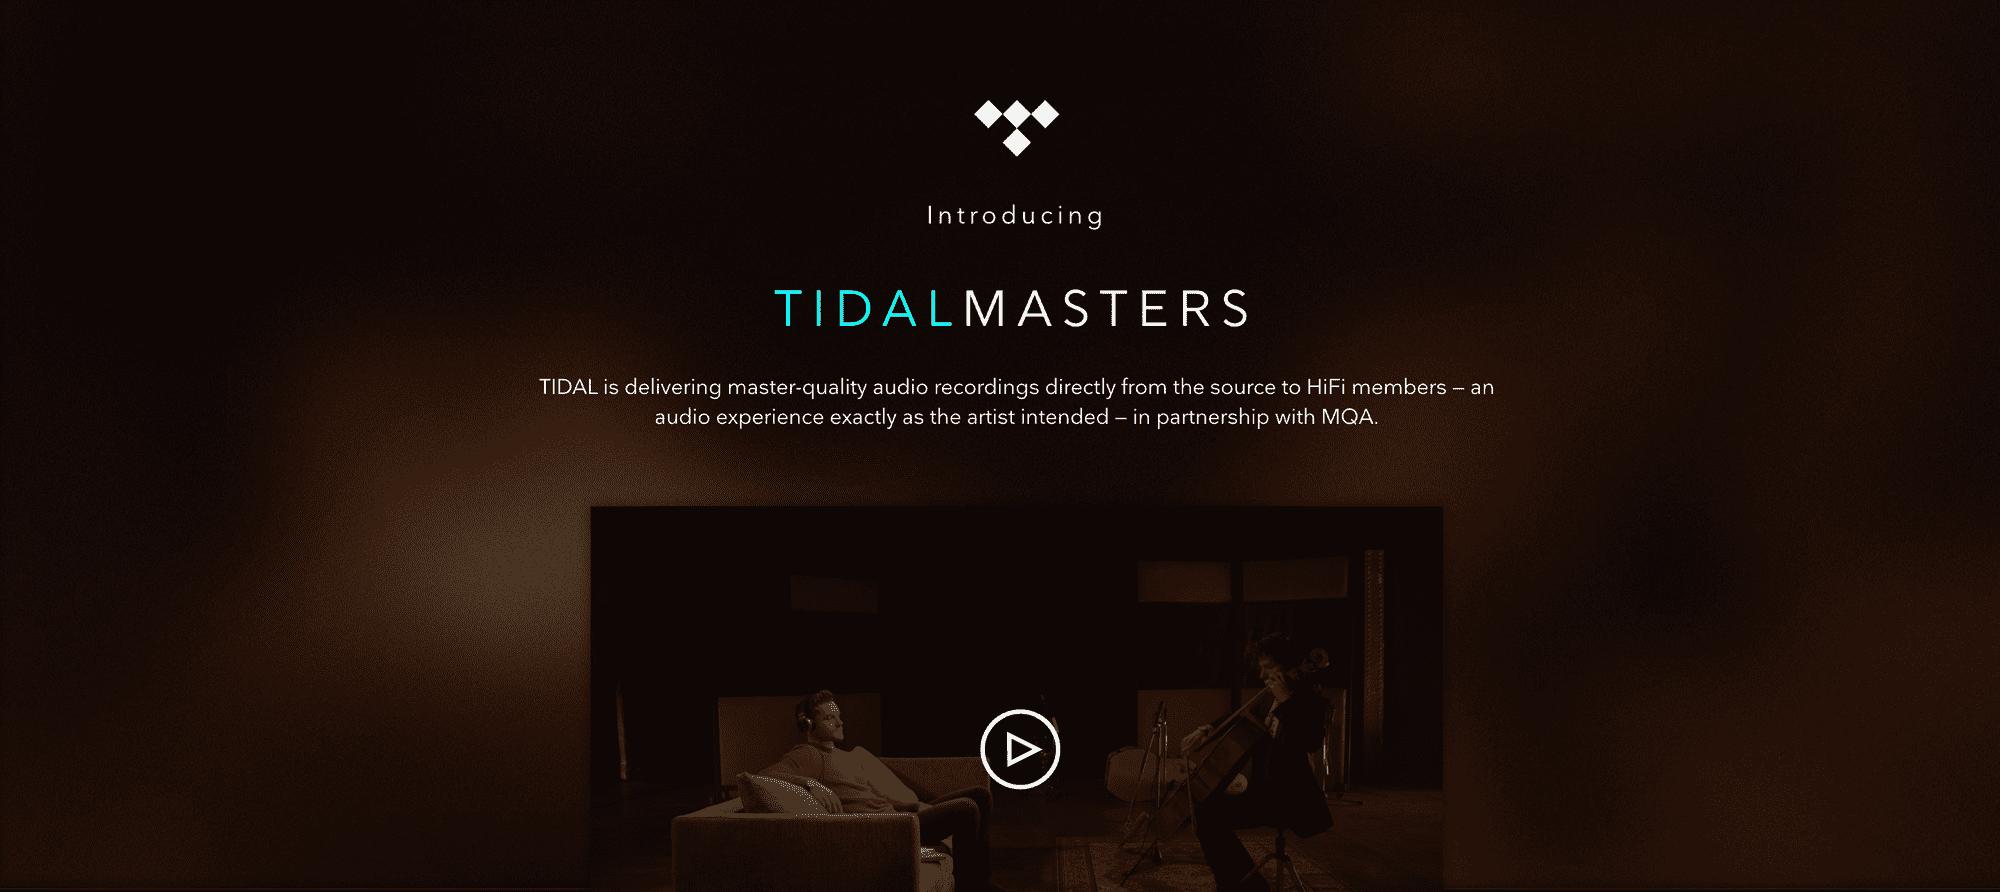 Tidal Master